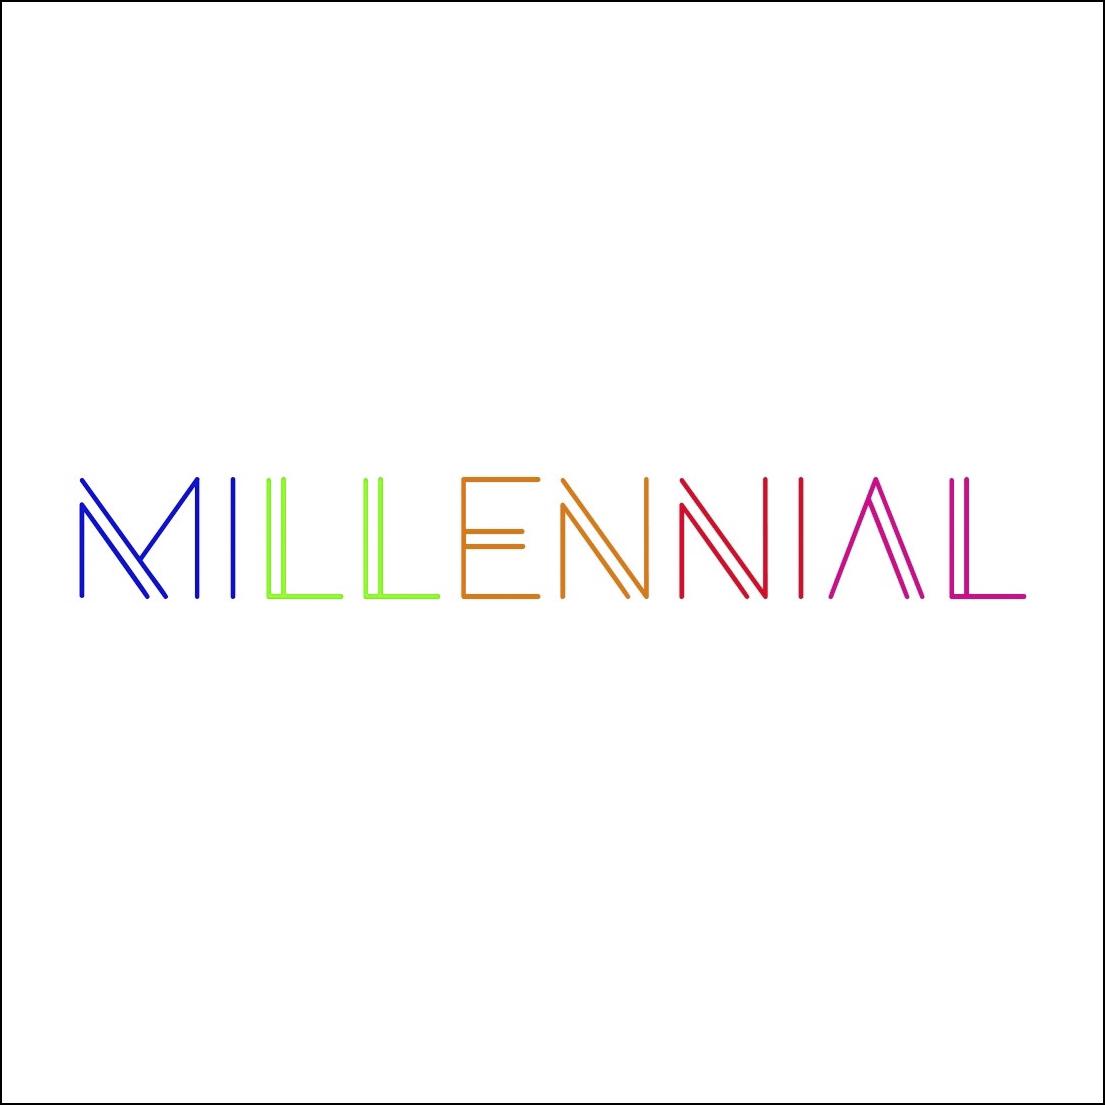 MillennialLogo_Square.jpg